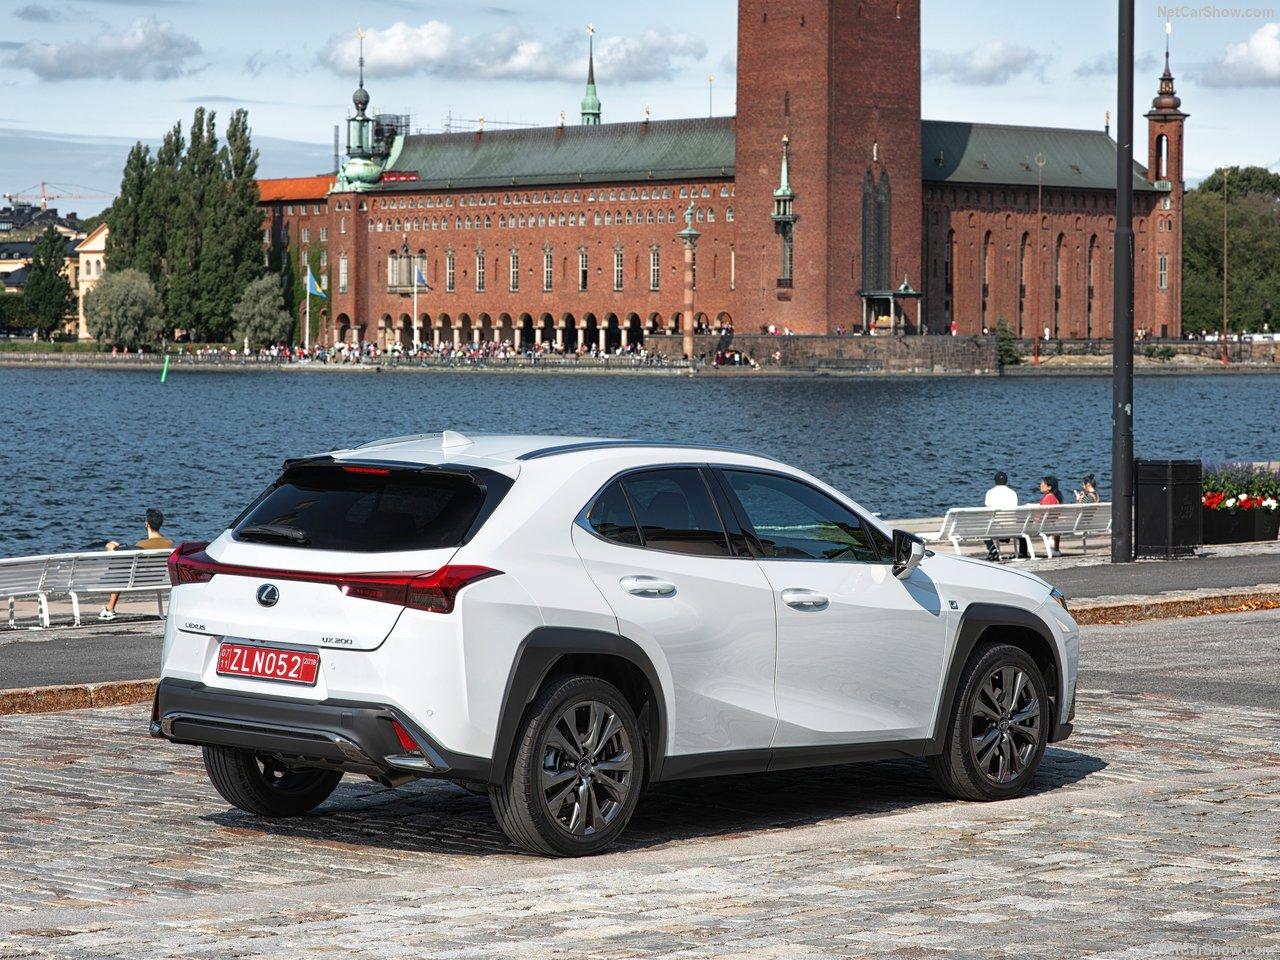 Lexus-UX-2019-1280-4e.jpg